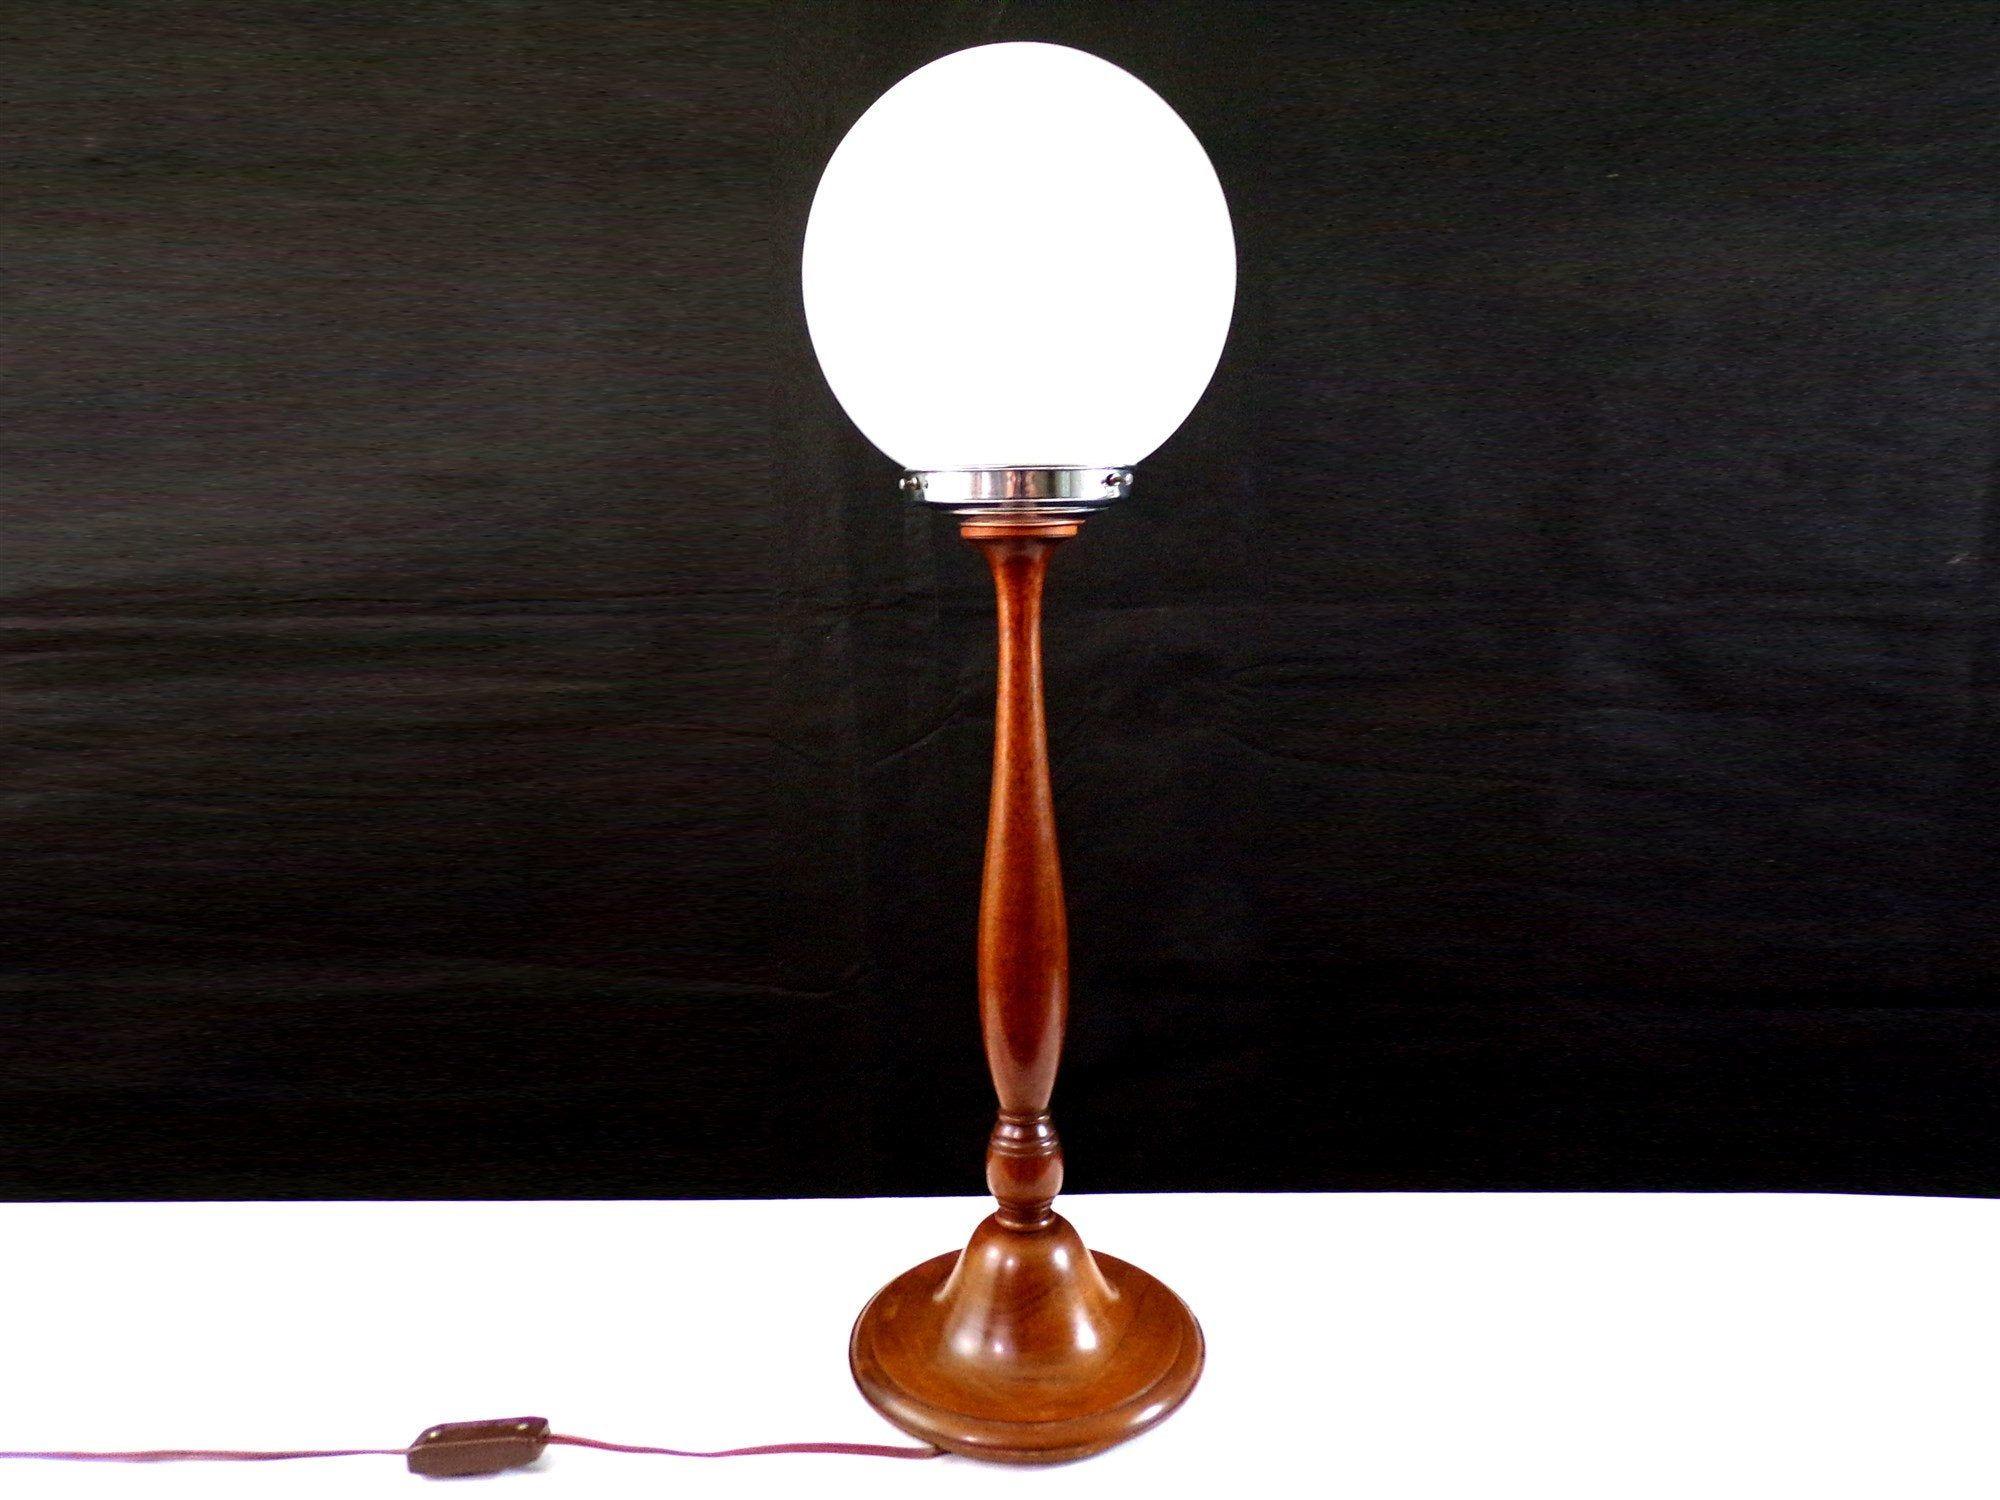 Grande Lampe A Poser En Bois Et Globe Opaline Blanche Decoration Retro Vintage Lamp Novelty Lamp Table Lamp